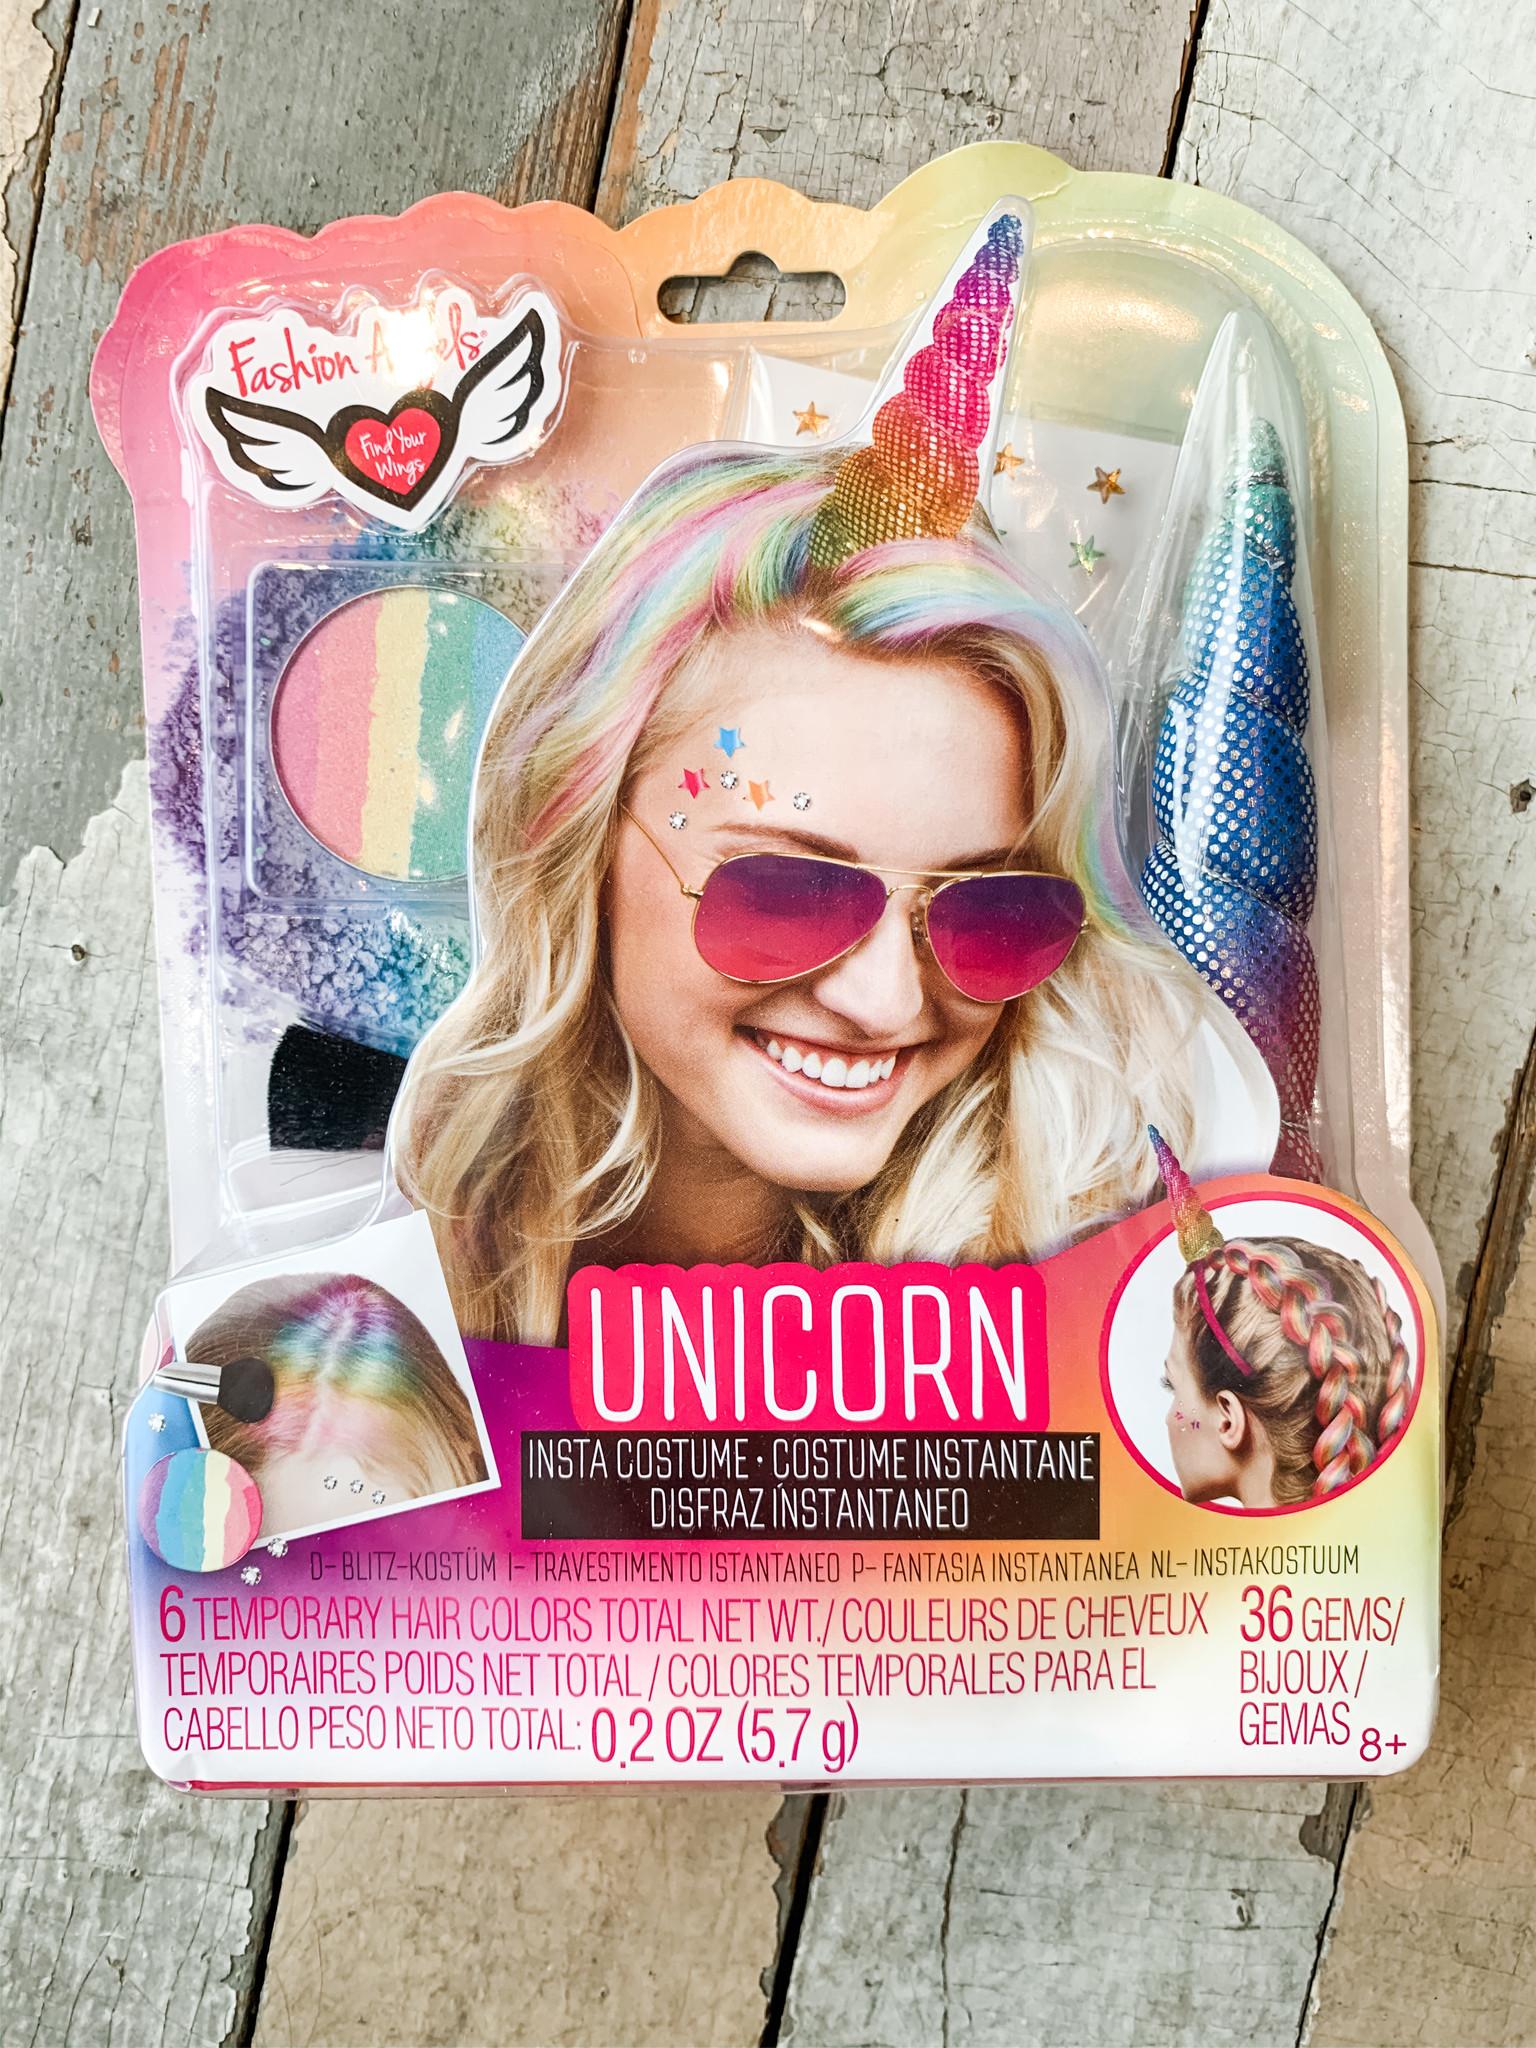 Fashion Angels Unicorn Costume